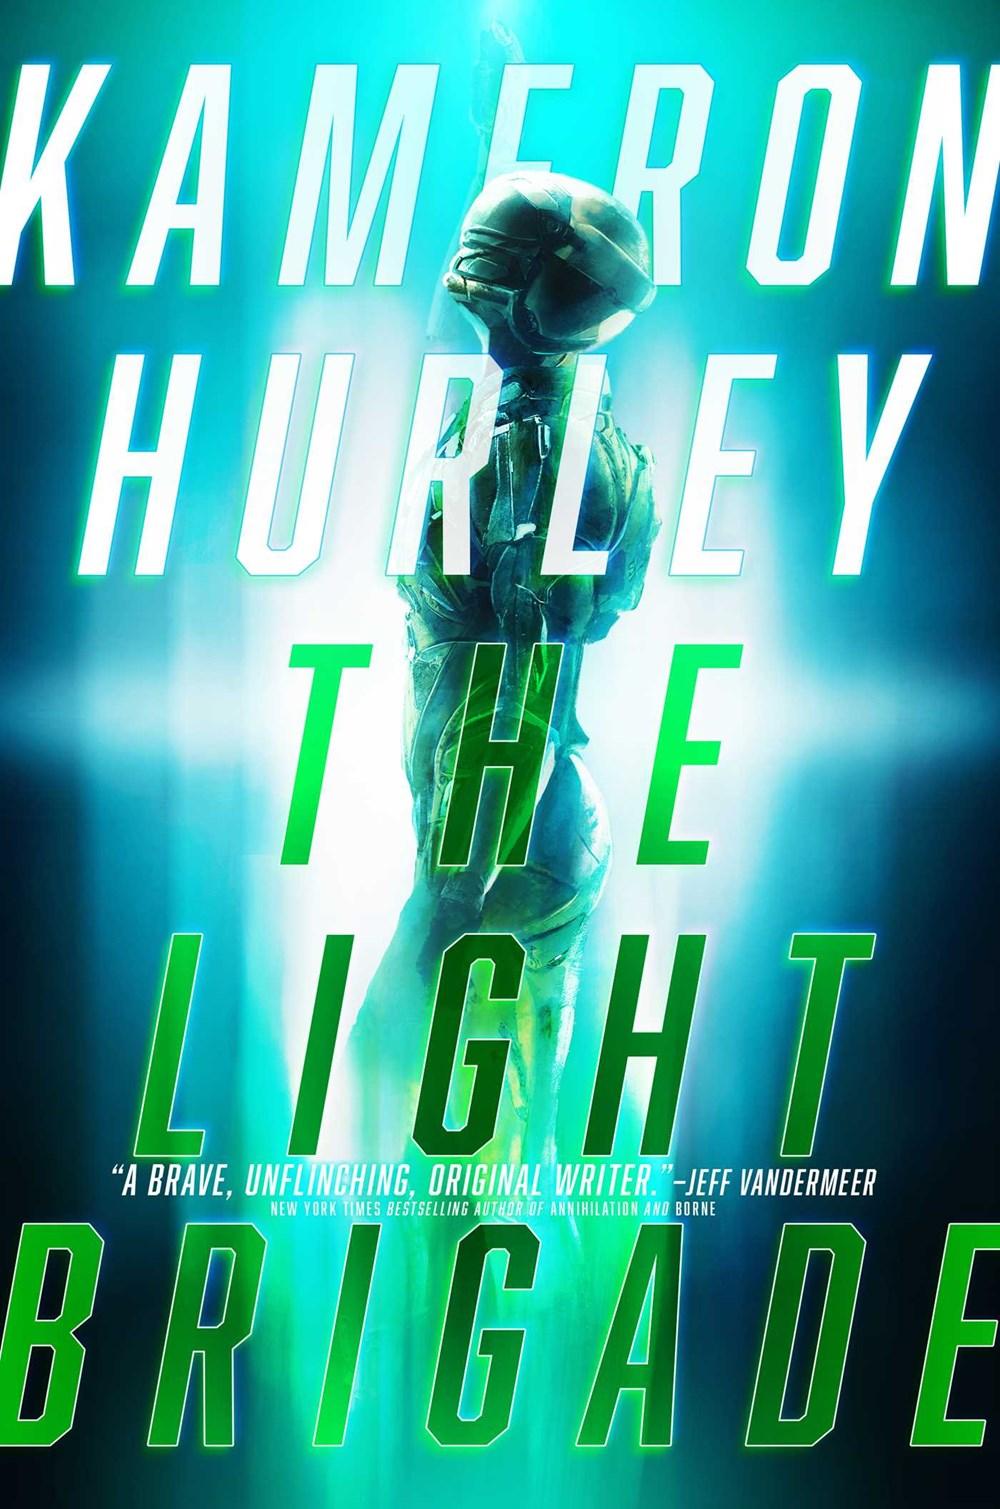 The Light Brigade_Kameron Hurley.jpg